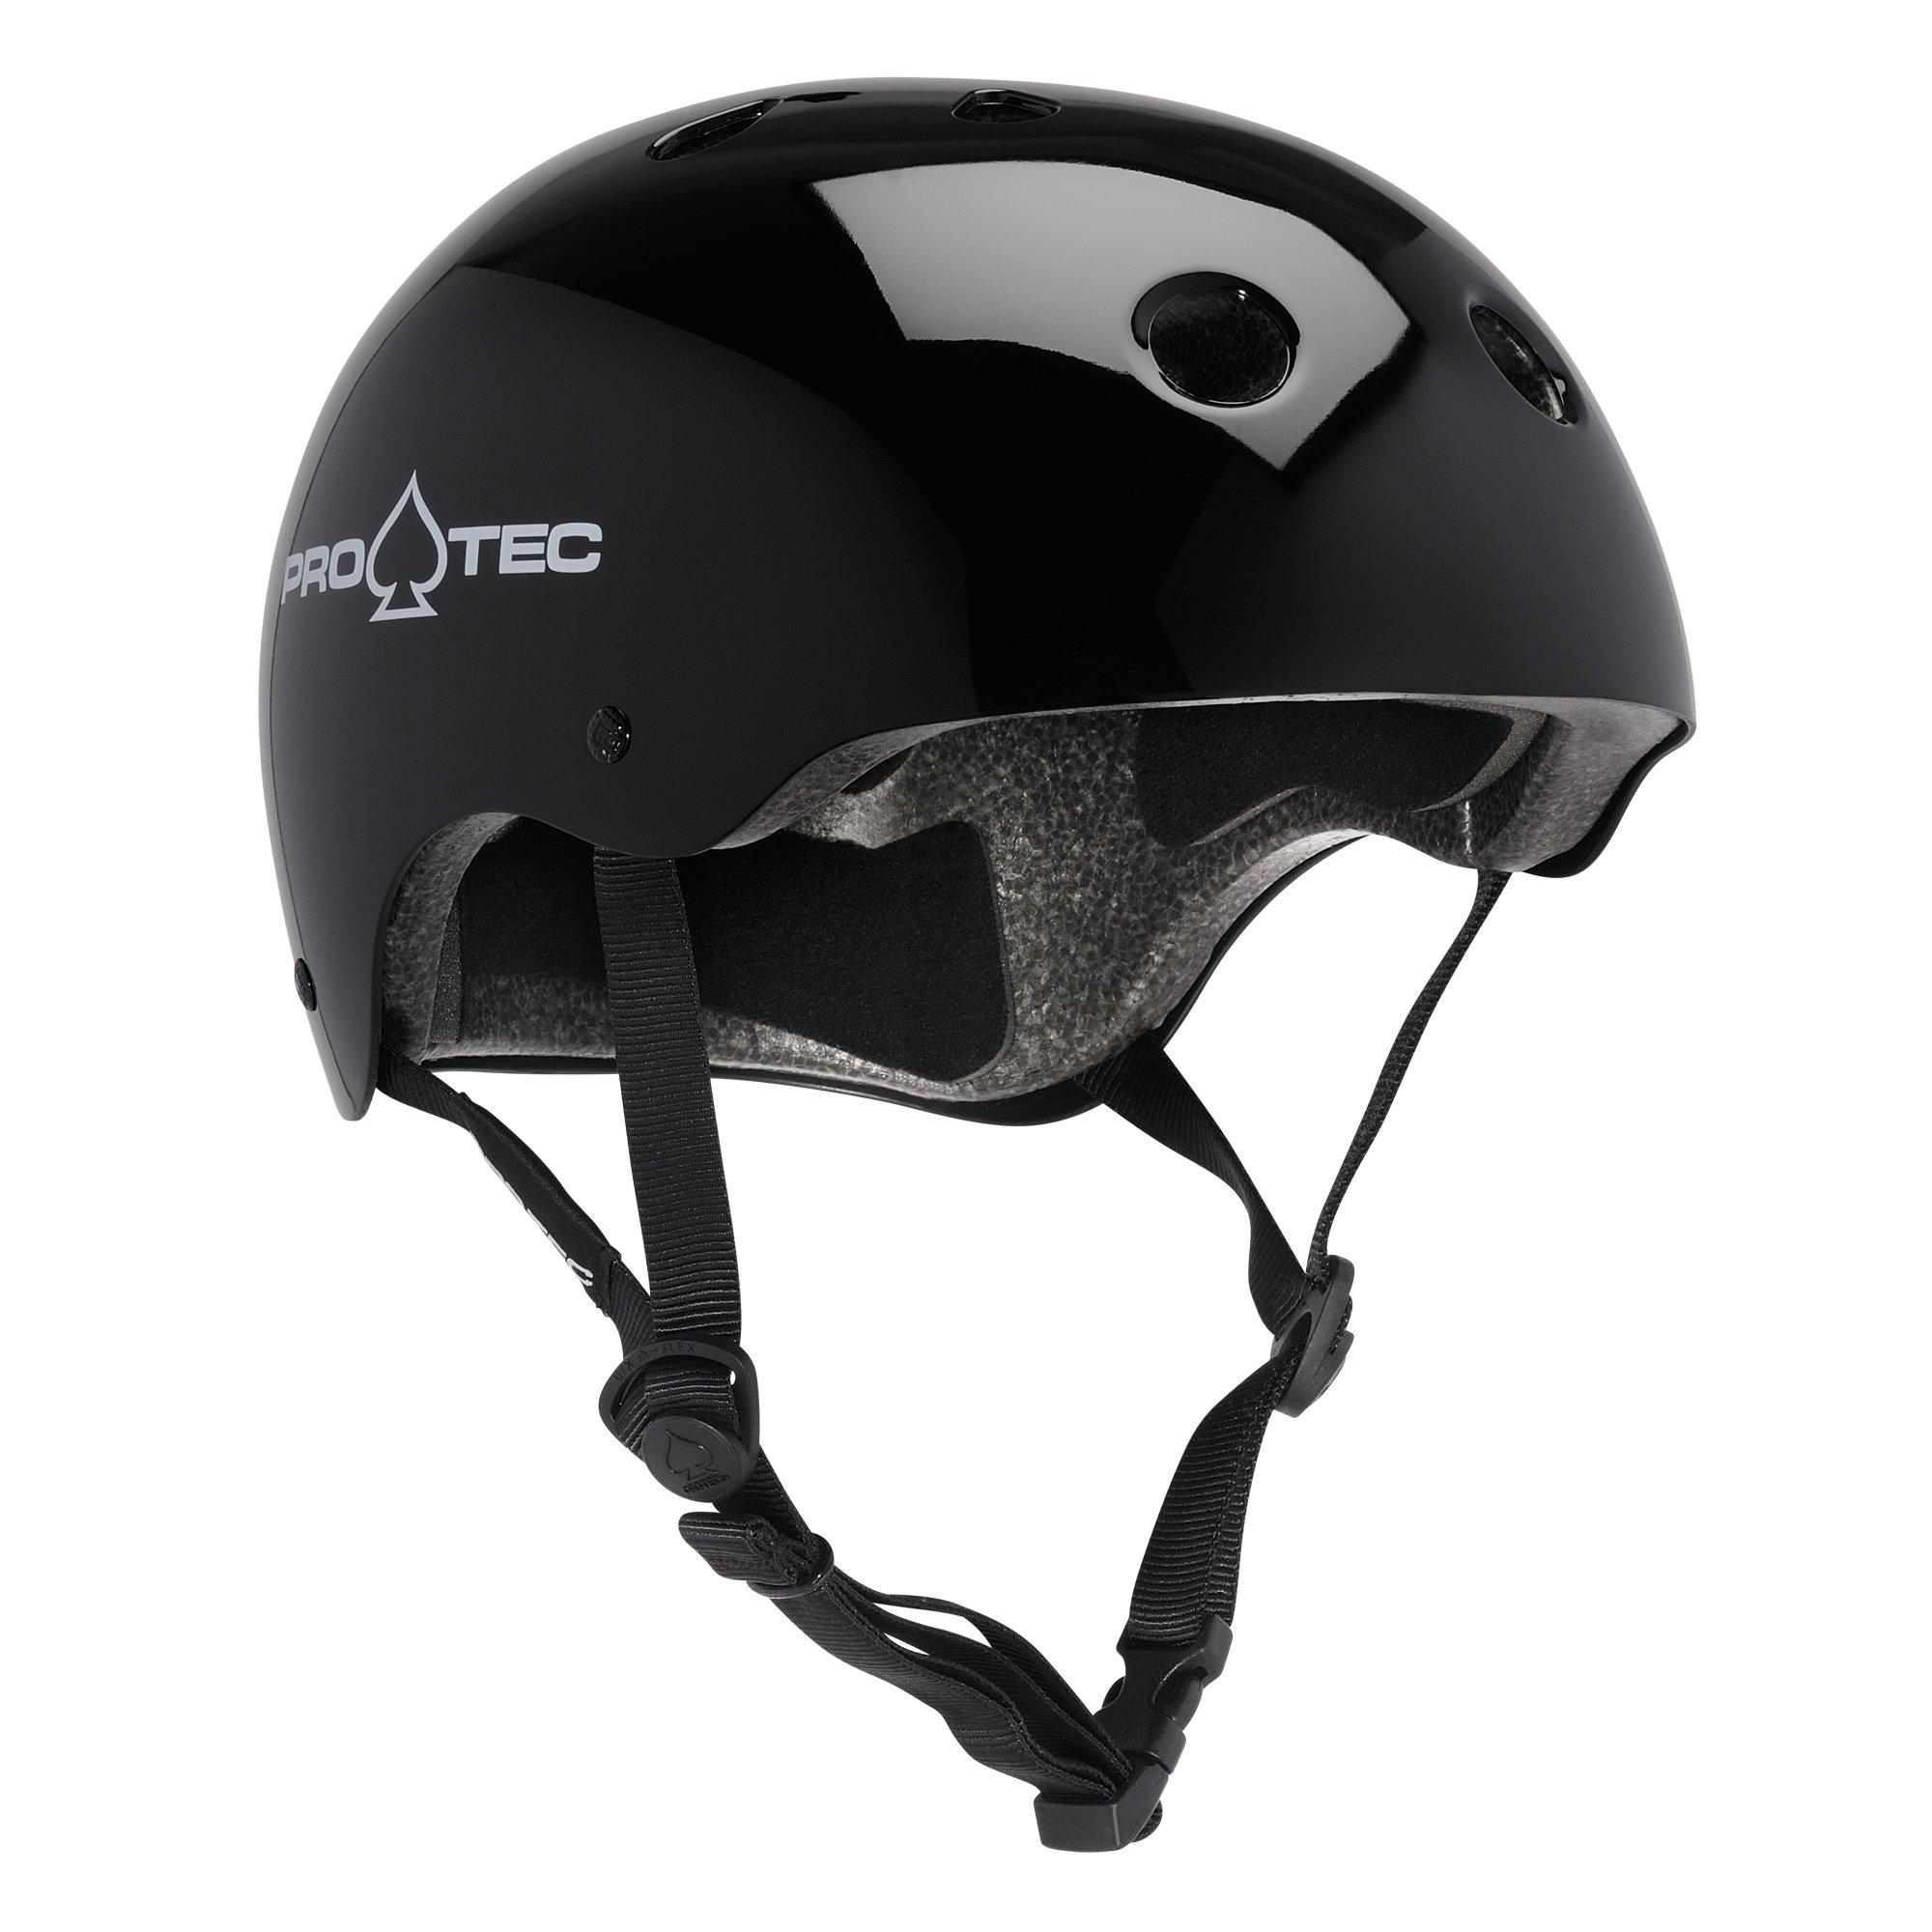 Pro-Tec Skate-and-Skateboarding-Helmets Pro-Tec Classic cert